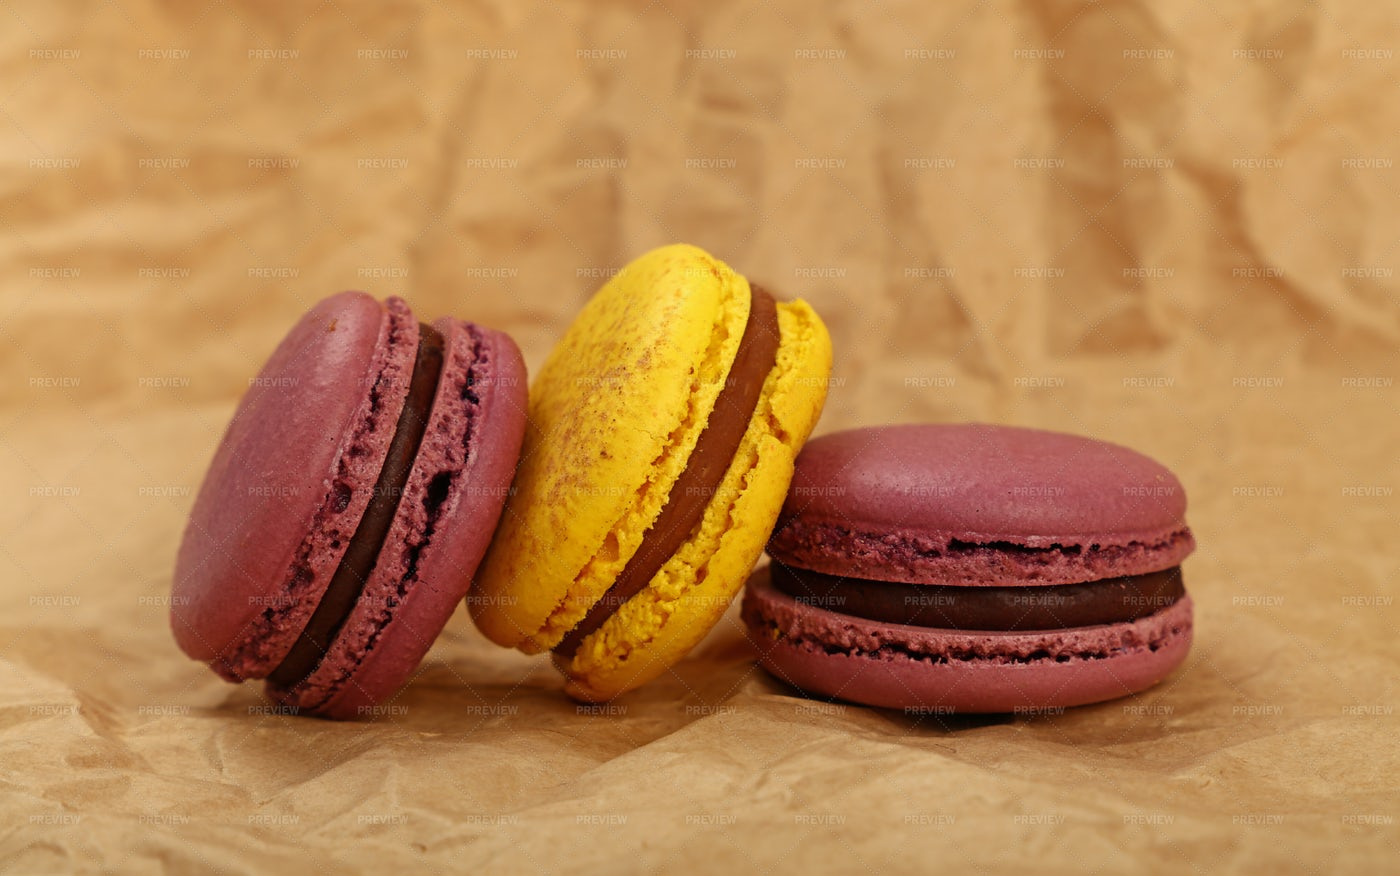 Macaron Cookies On Paper: Stock Photos